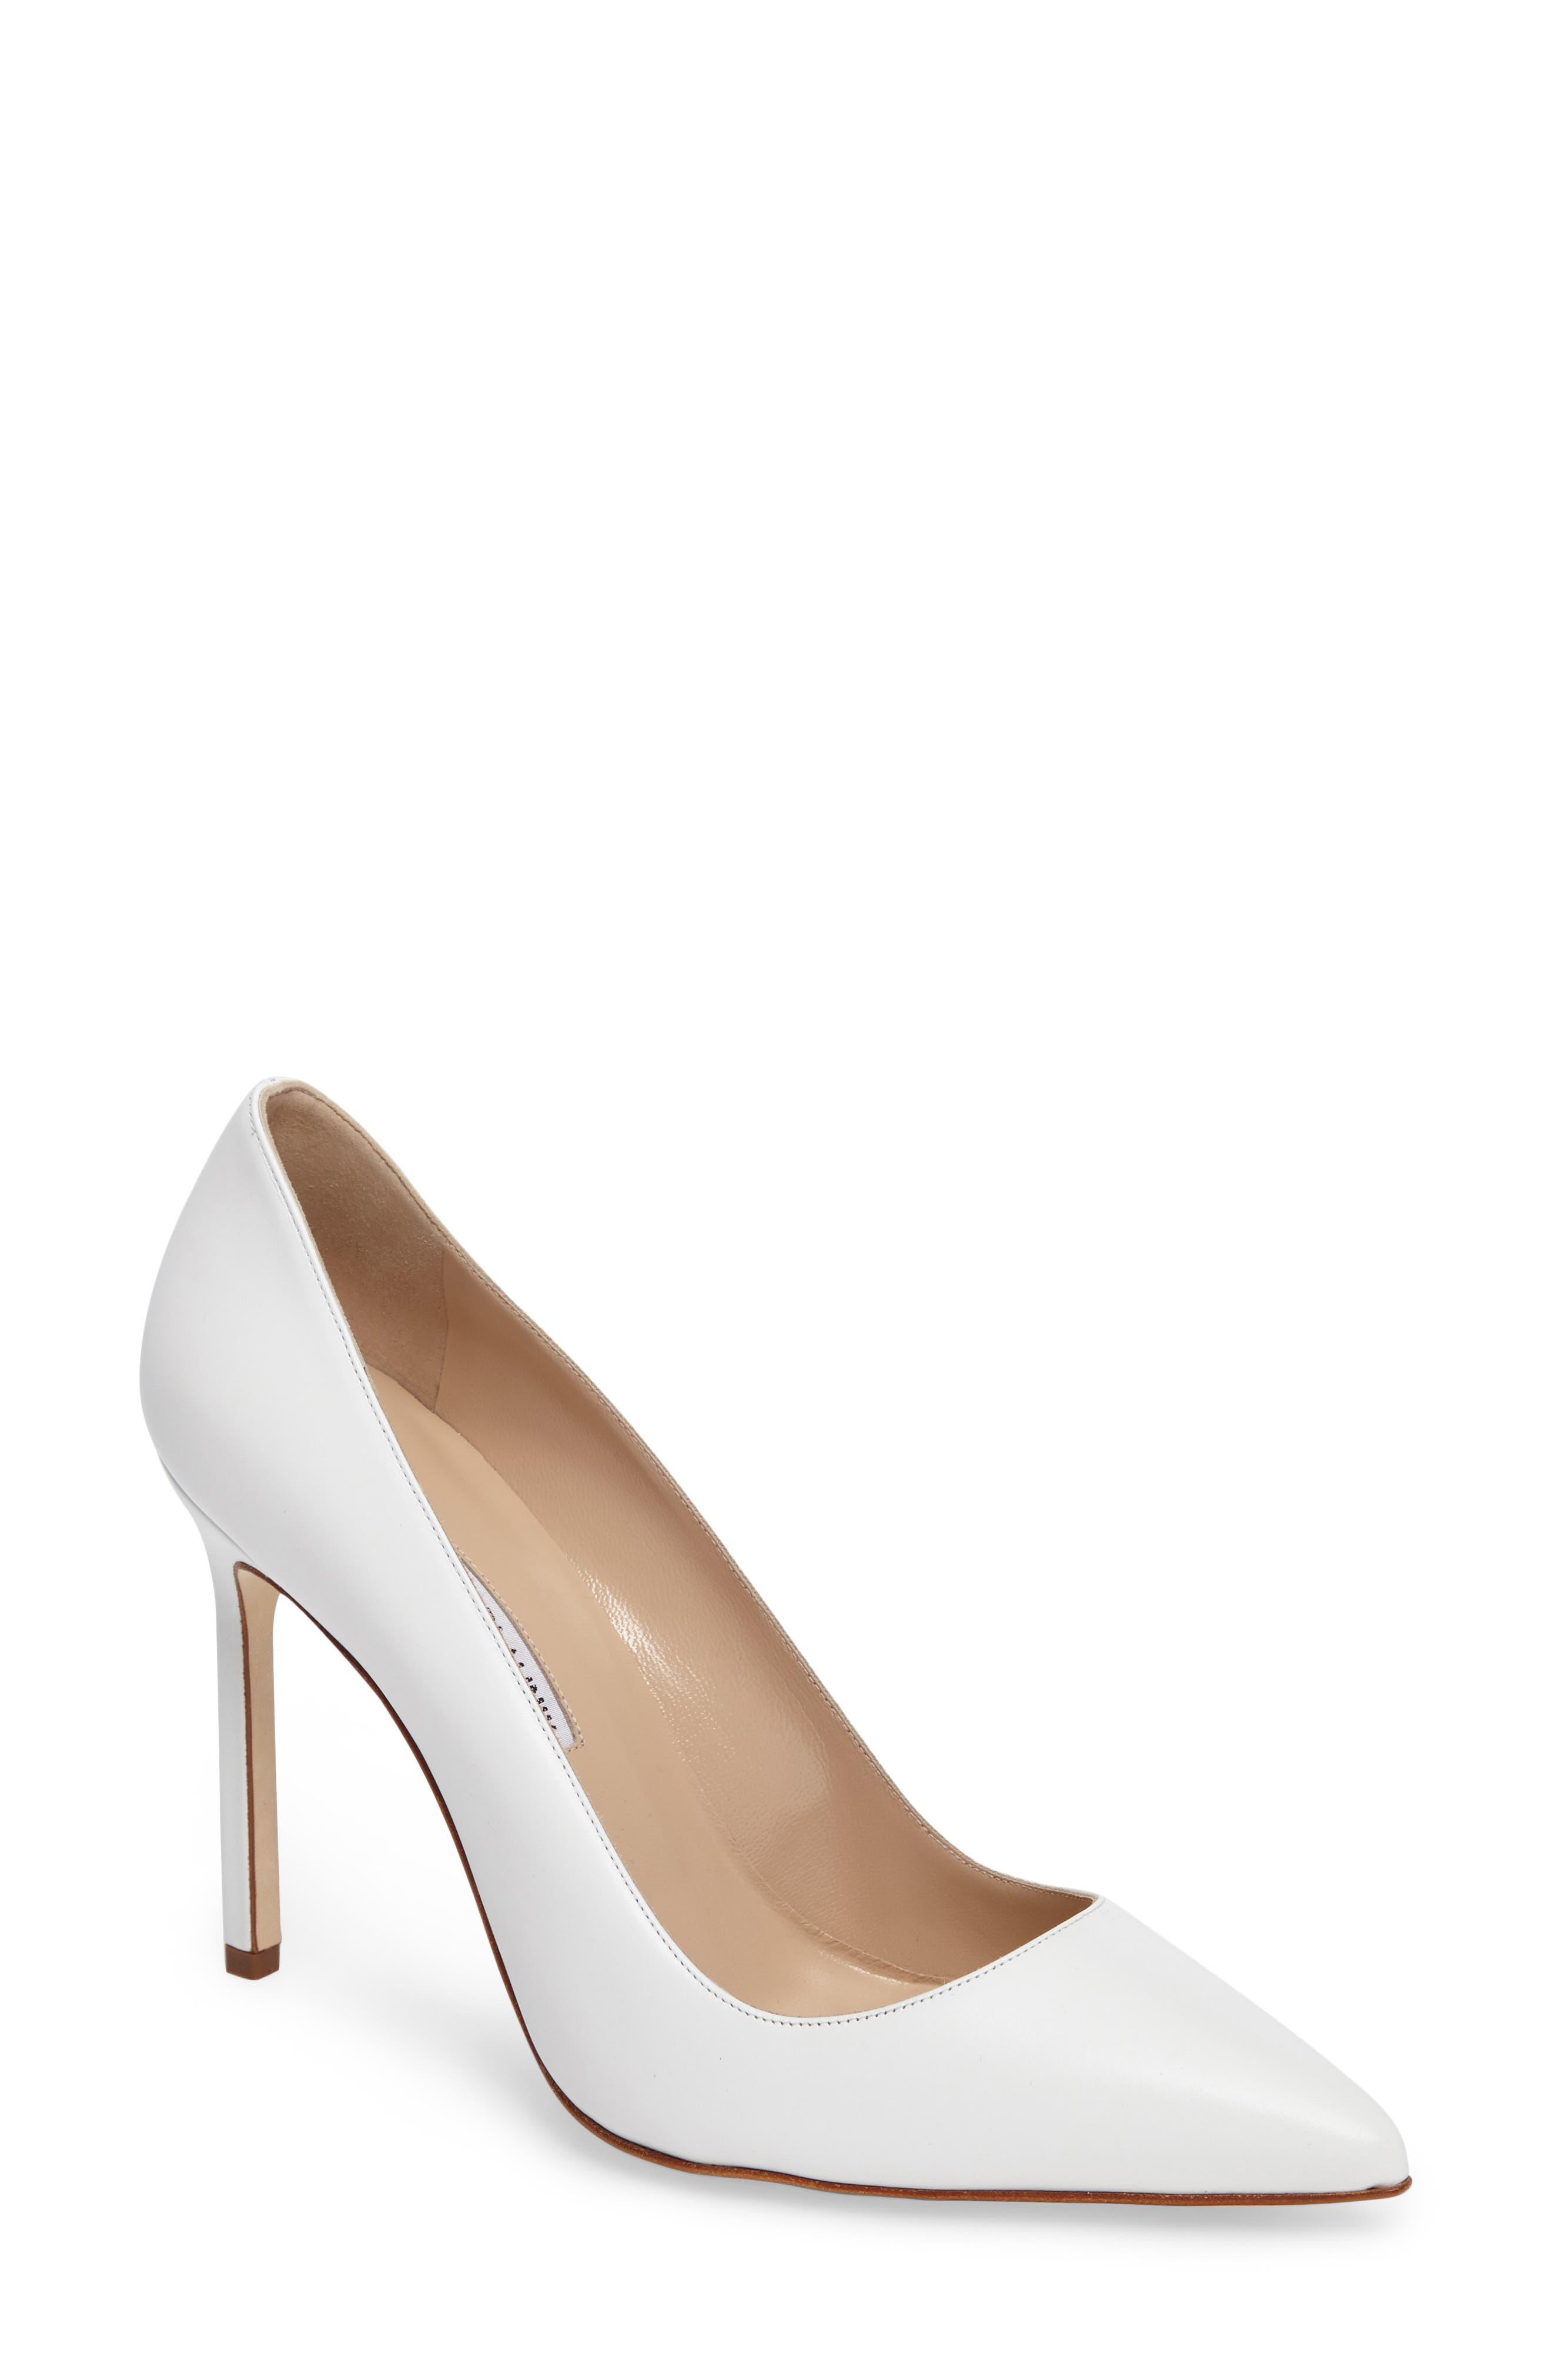 White Pump Heels VeLmyxqa